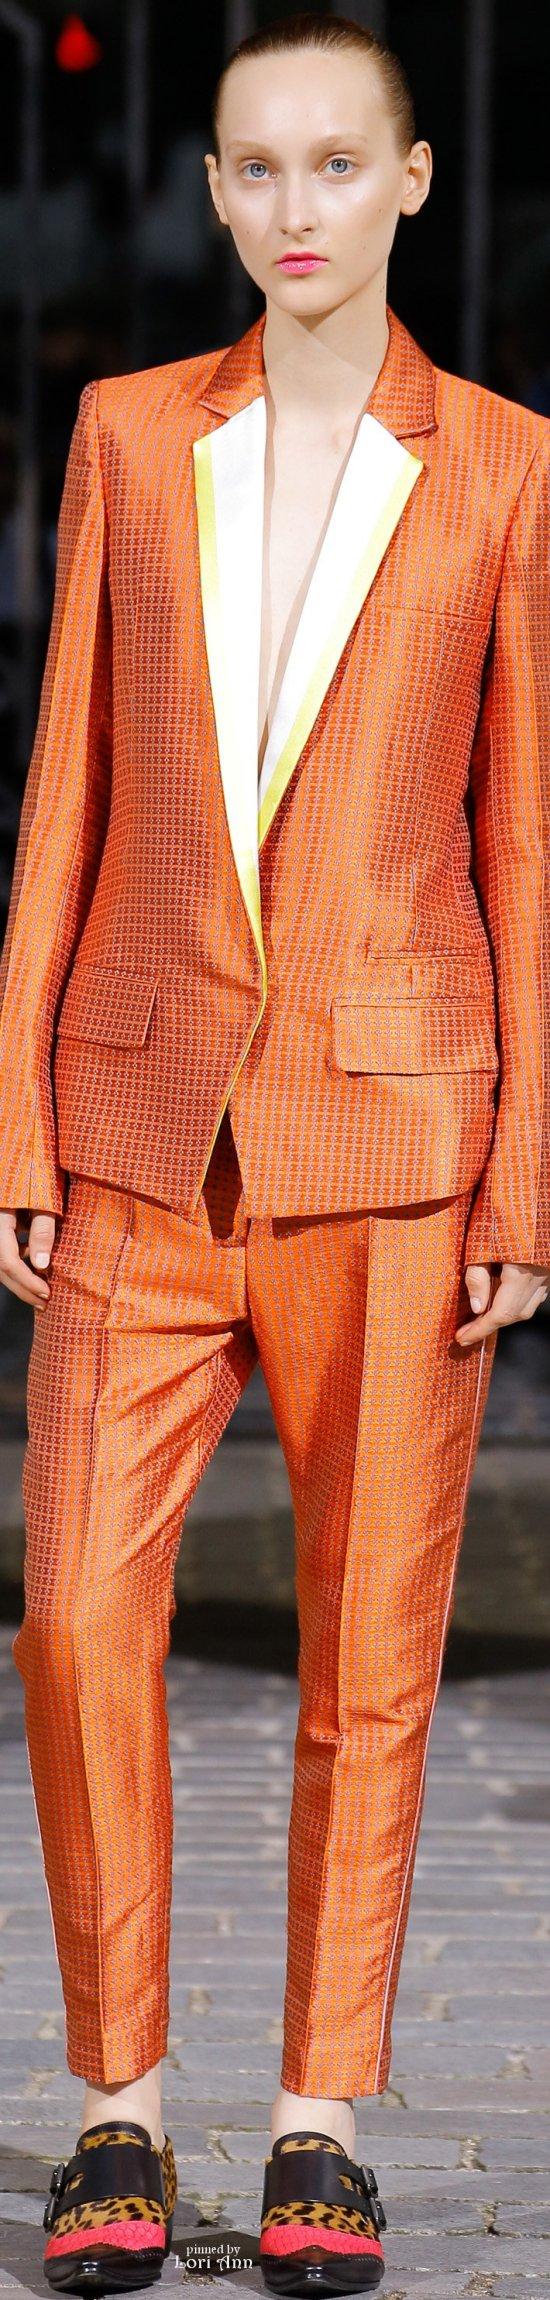 Haider Ackermann from Menswear Spring 2017